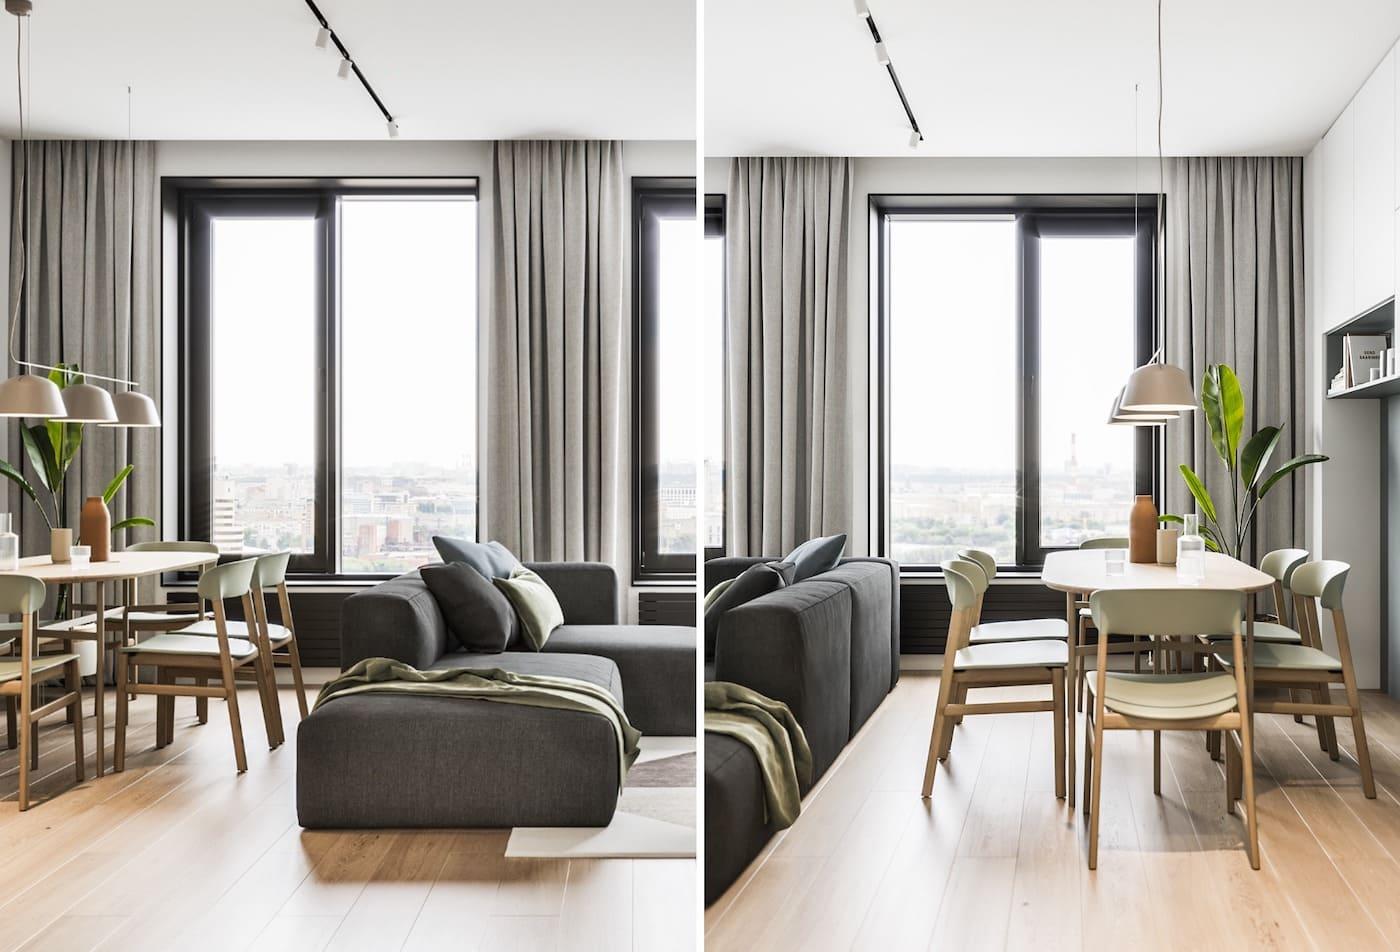 дизайн интерьера модной квартиры фото 46